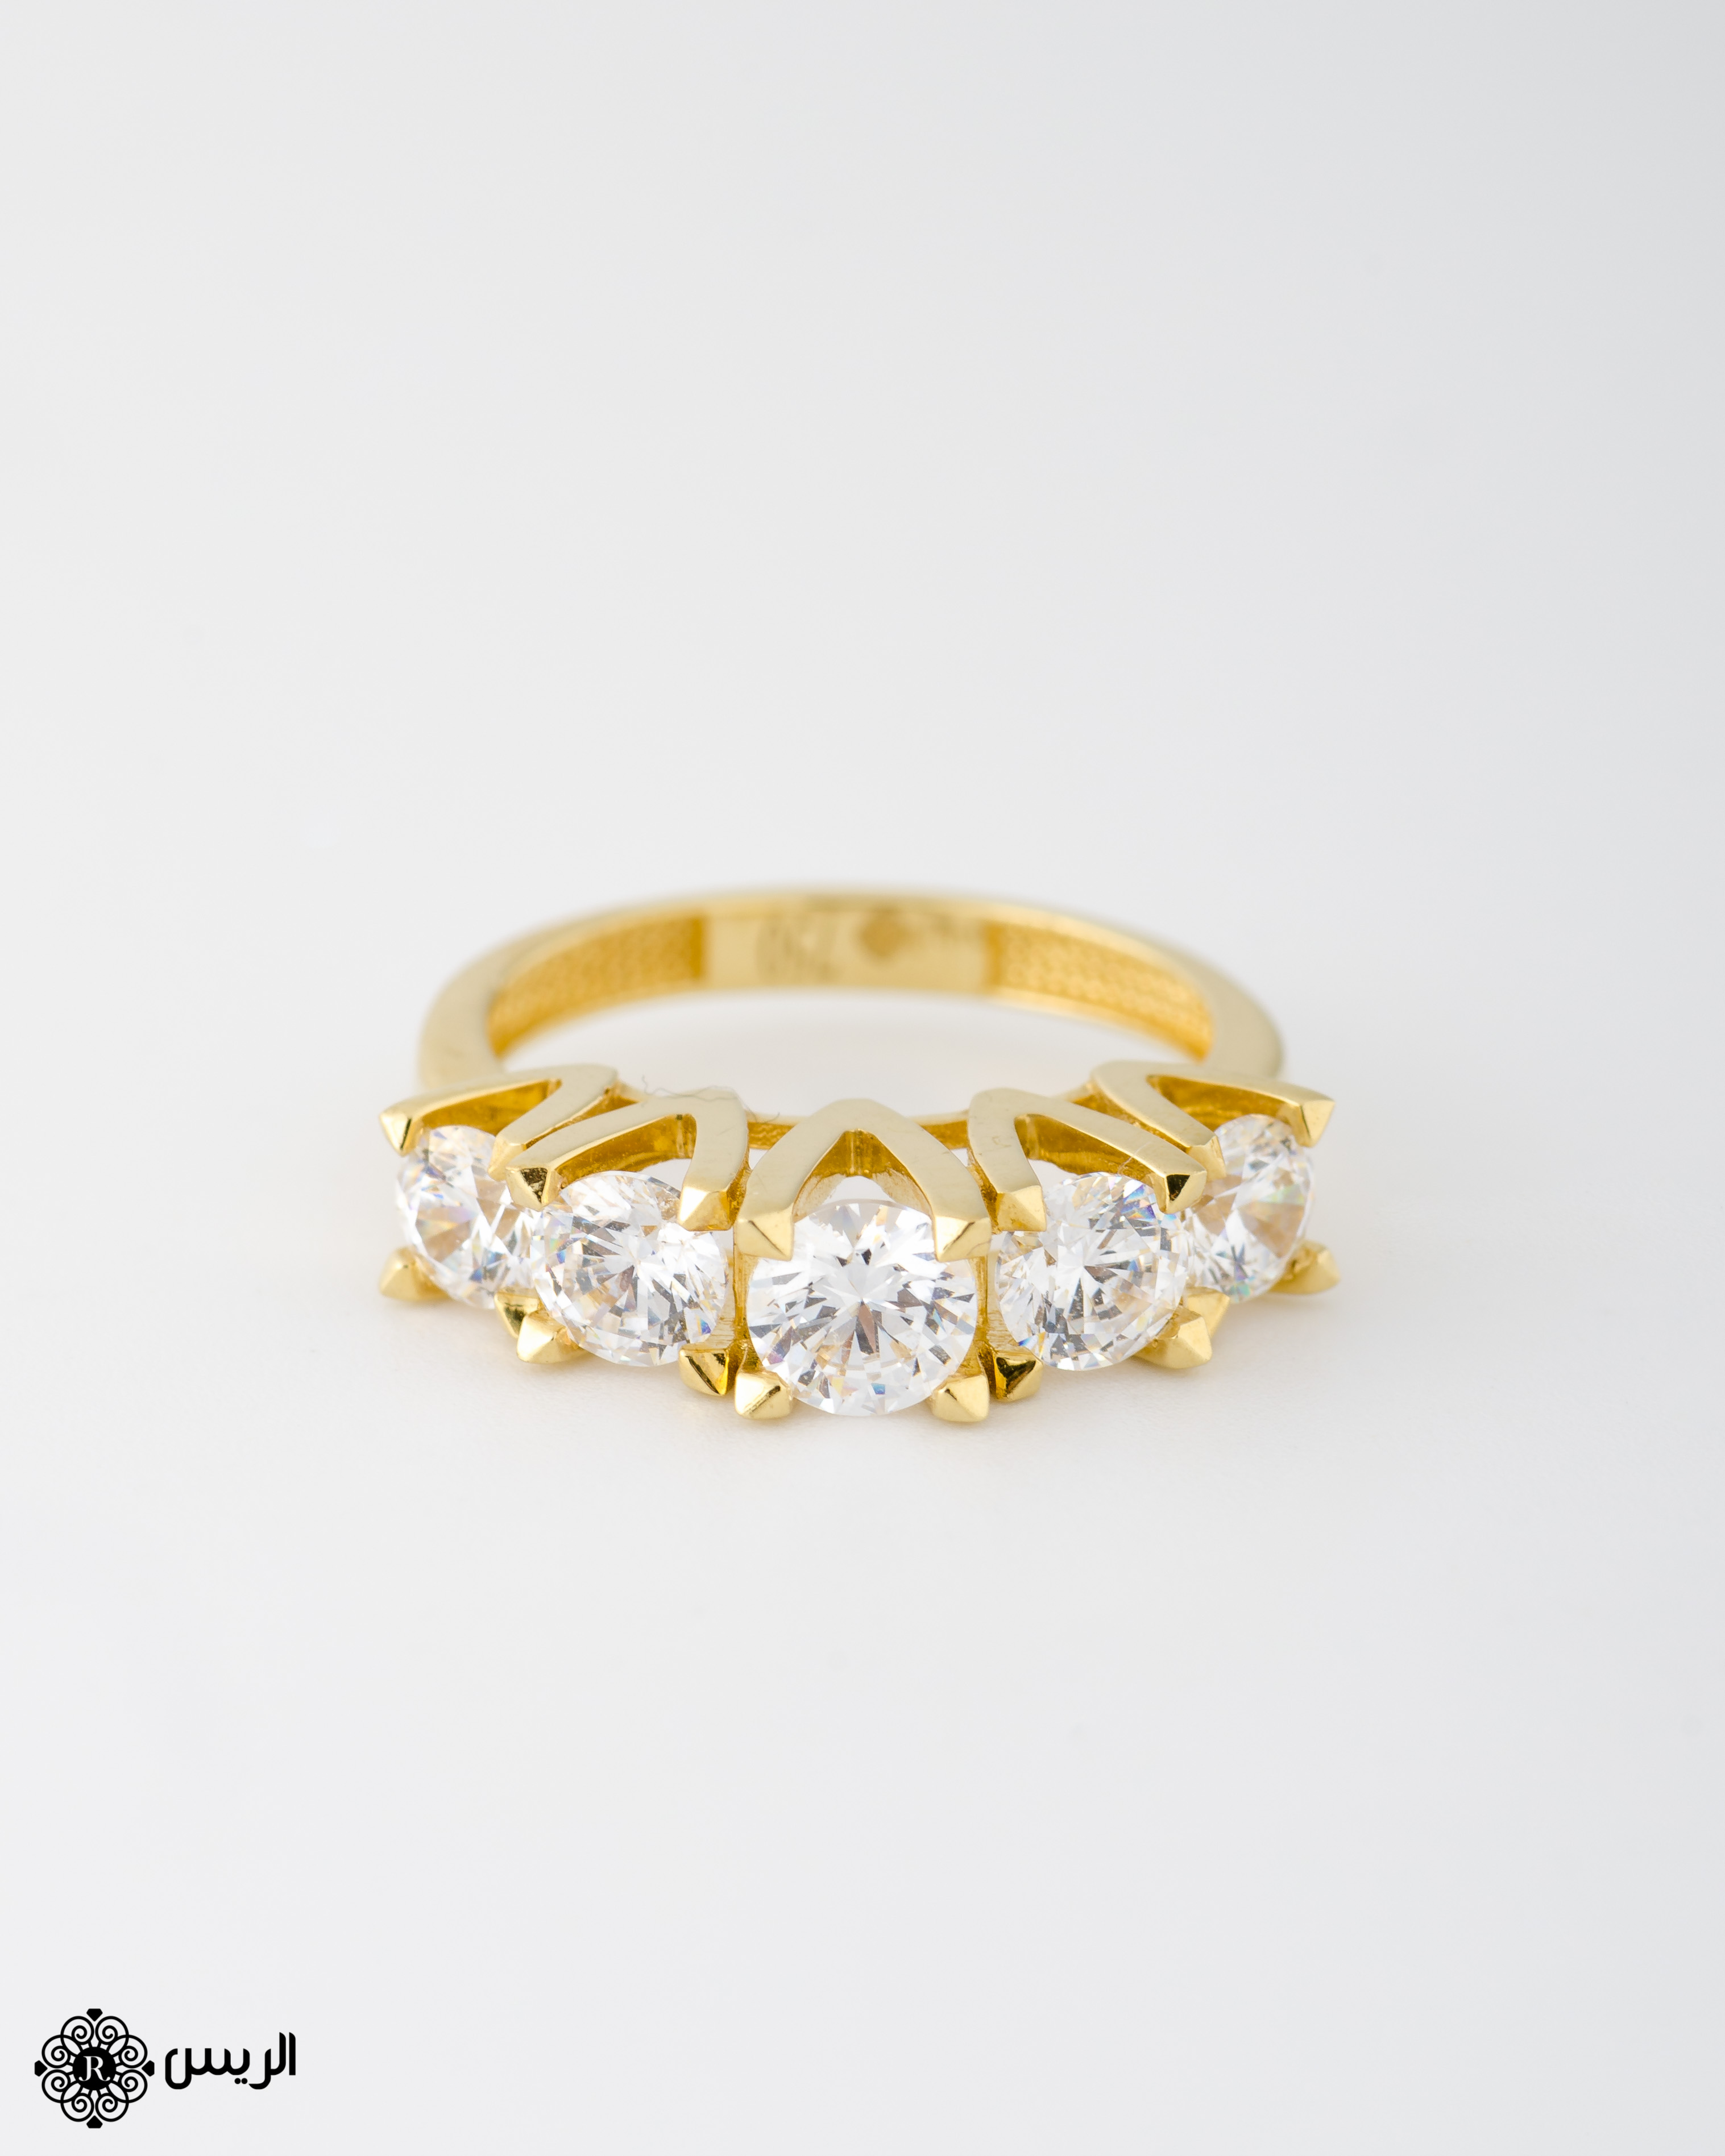 Raies jewelry Solitaire Ring with 5 Stones خاتم سوليتير بخمسة فصوص الريس للمجوهرات